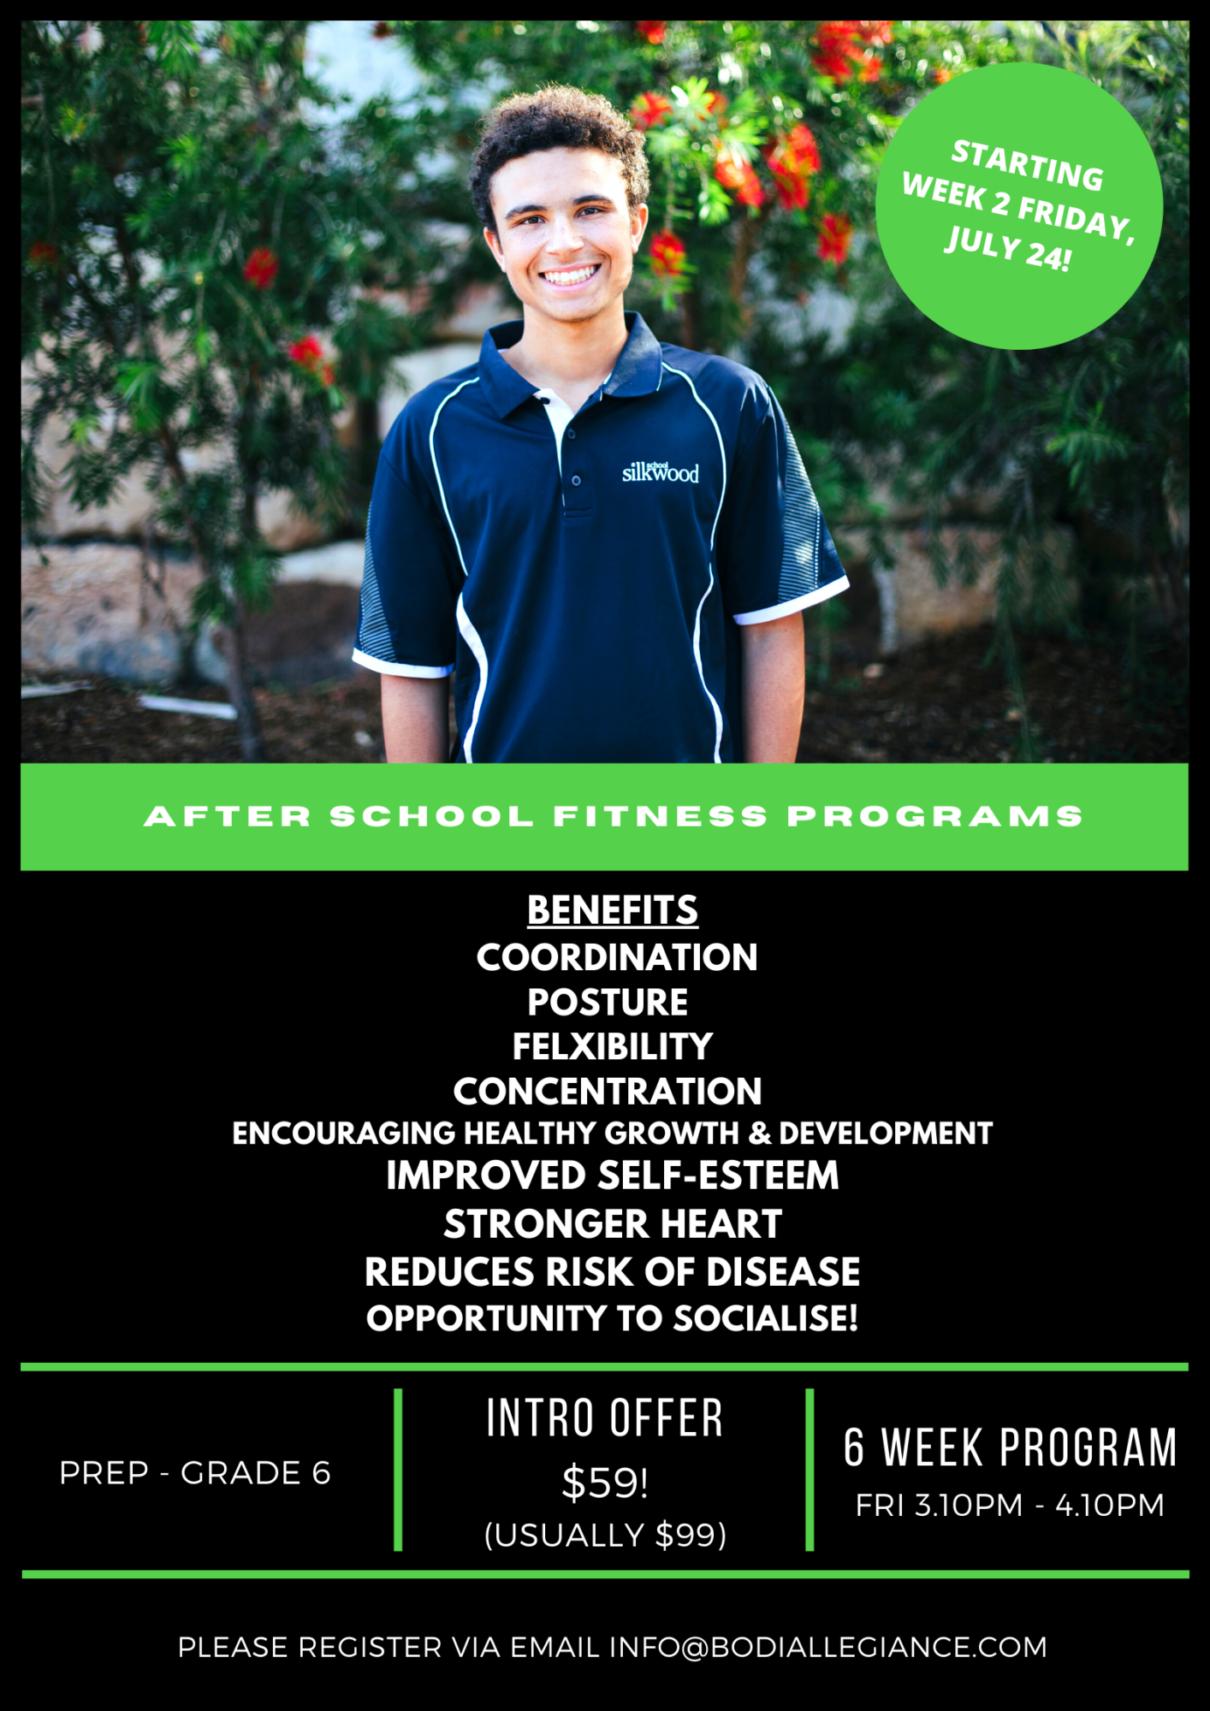 Bodi Allegiance Junior Fitness Program - Silkwood School